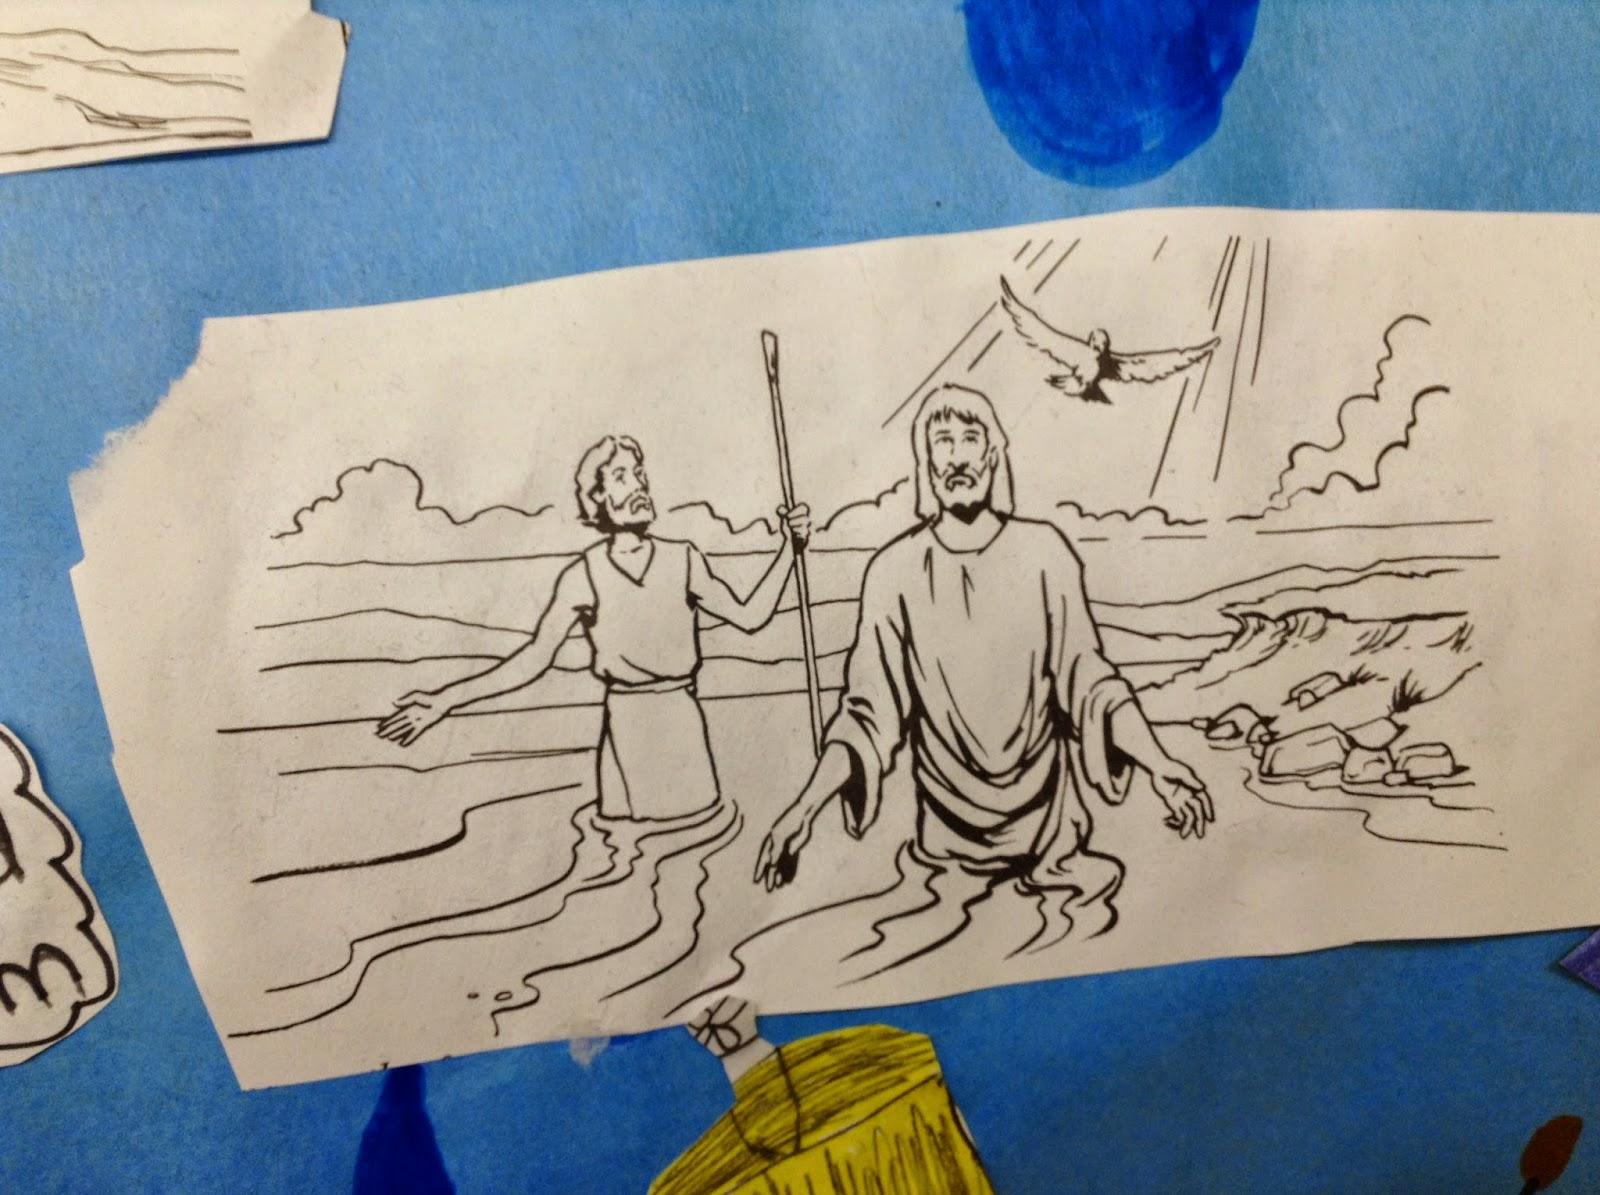 Schoolartsroom Art Education Blog For K 12 Art Teachers Playing